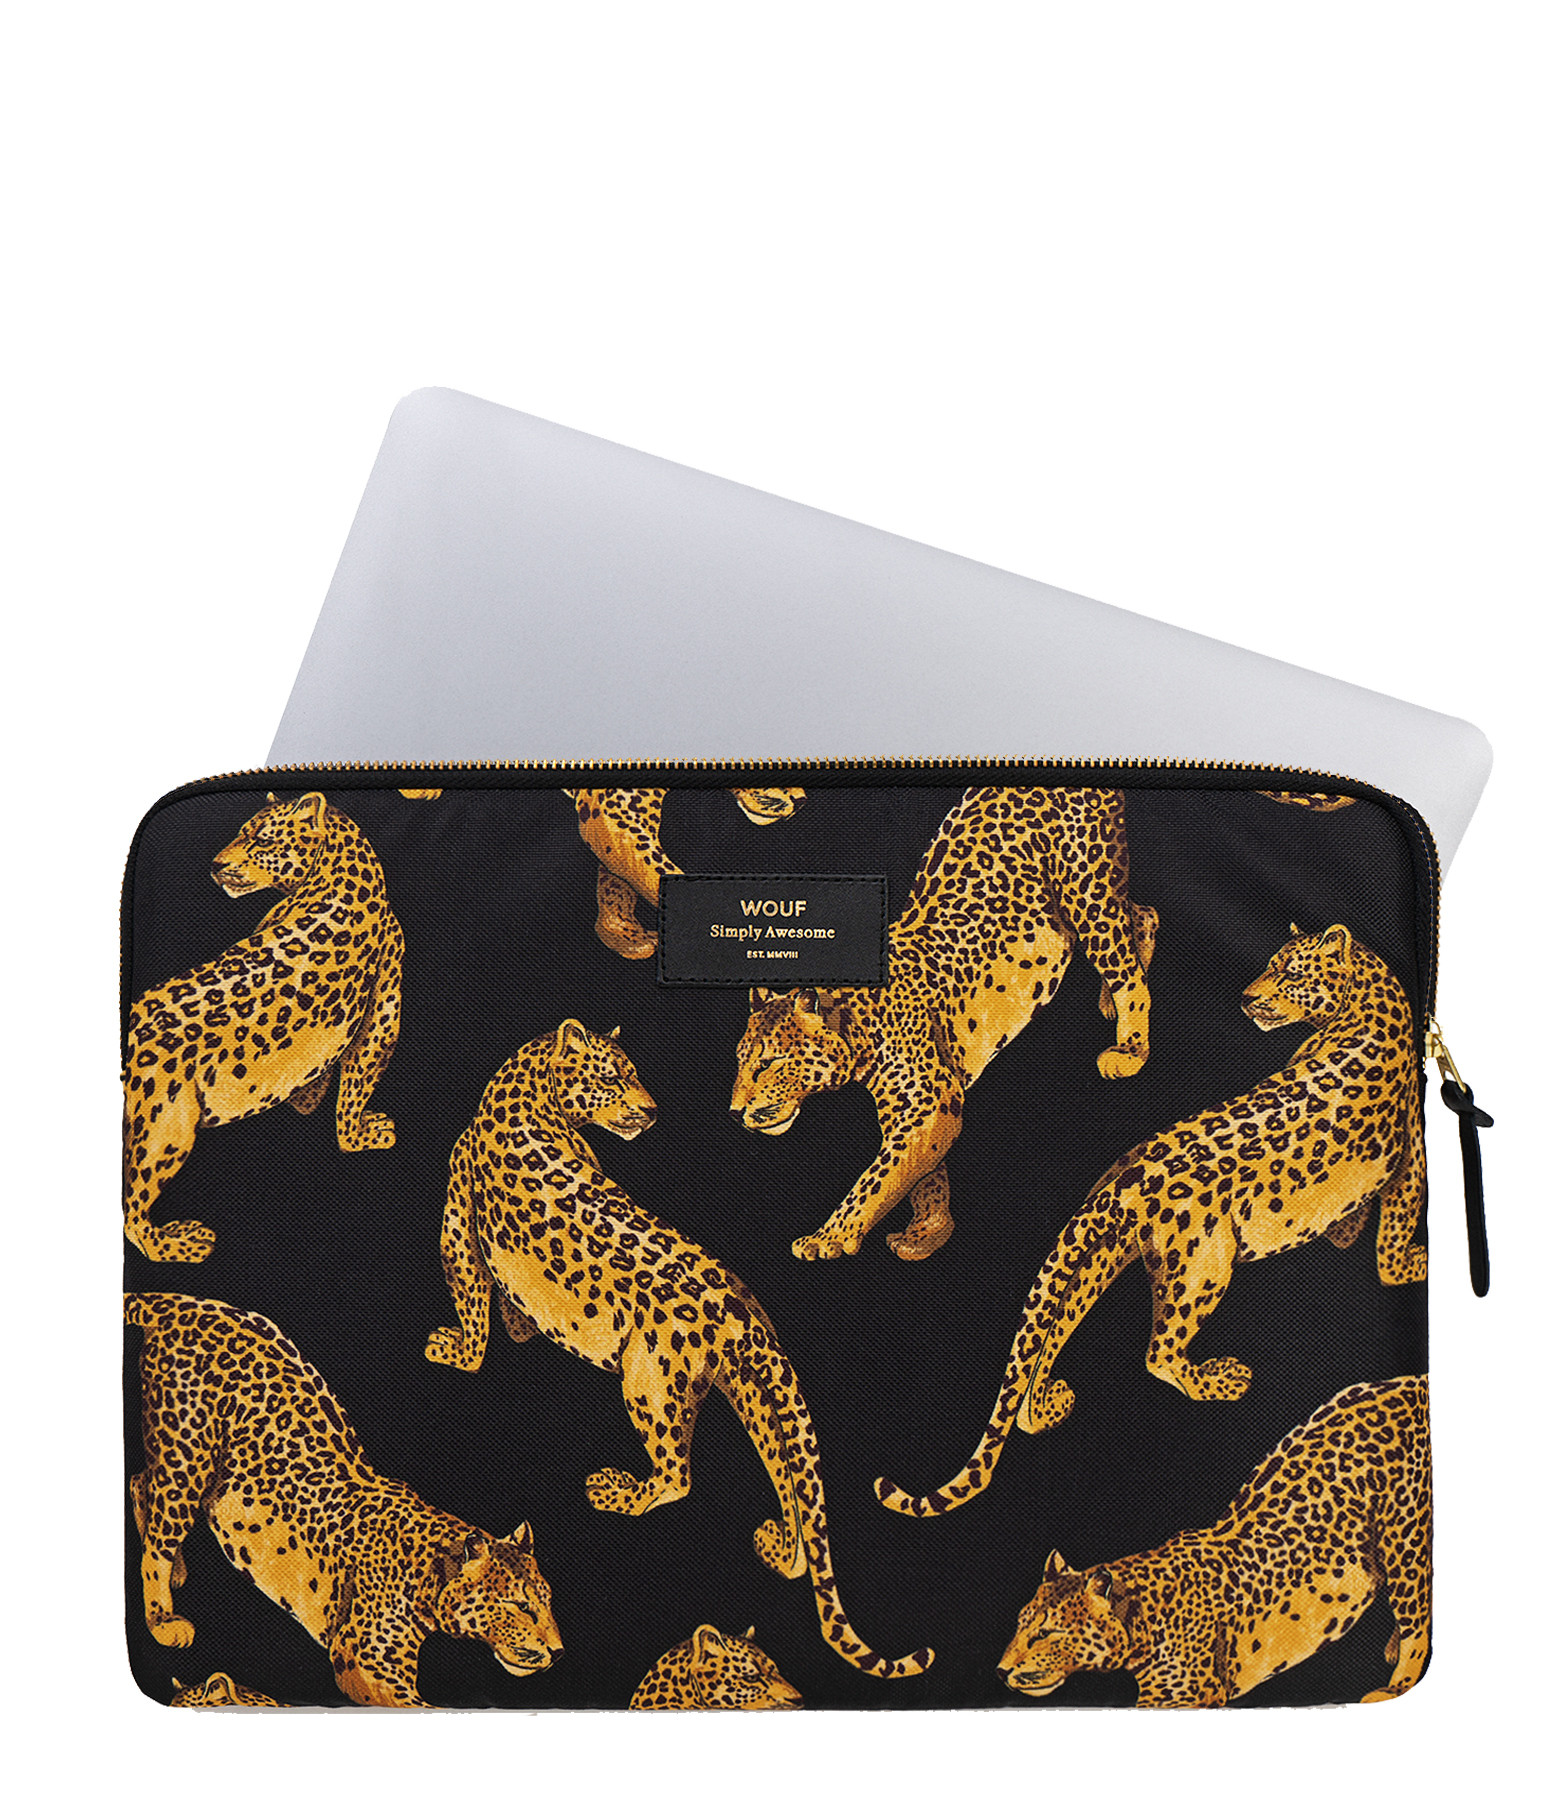 WOUF - Housse 13' Black Leopard